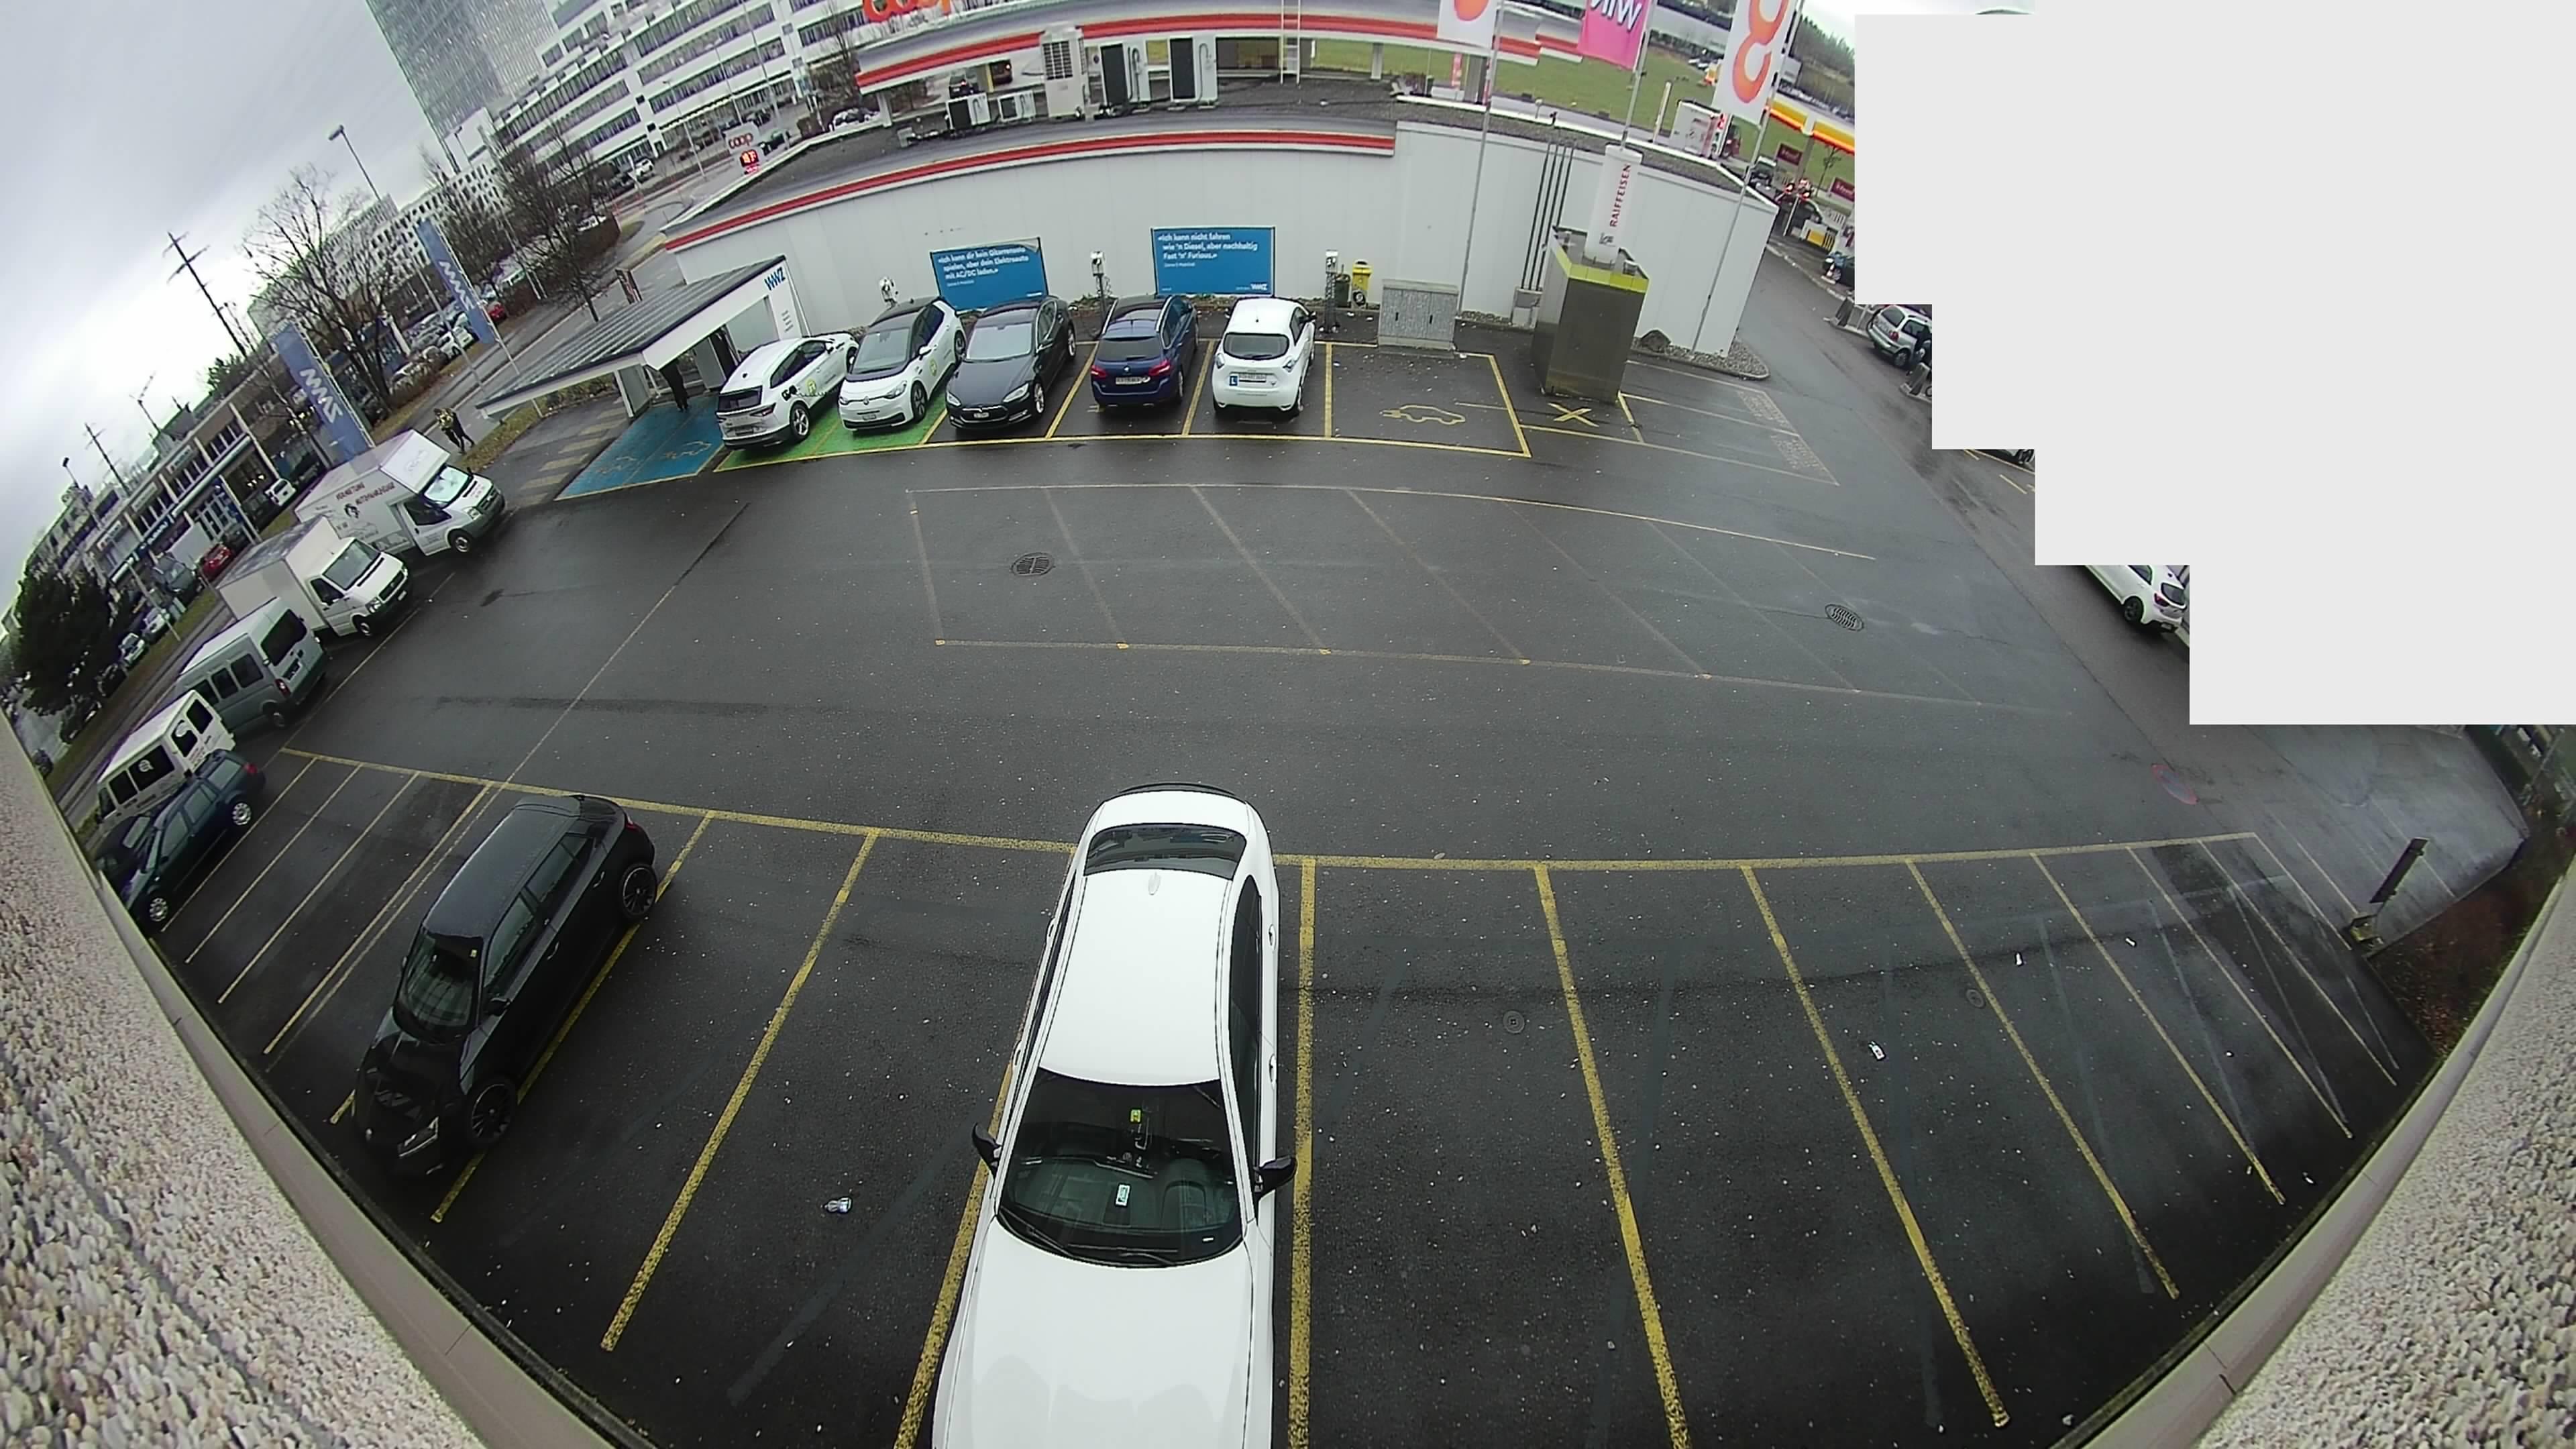 Rotkreuz Coop Tankstelle